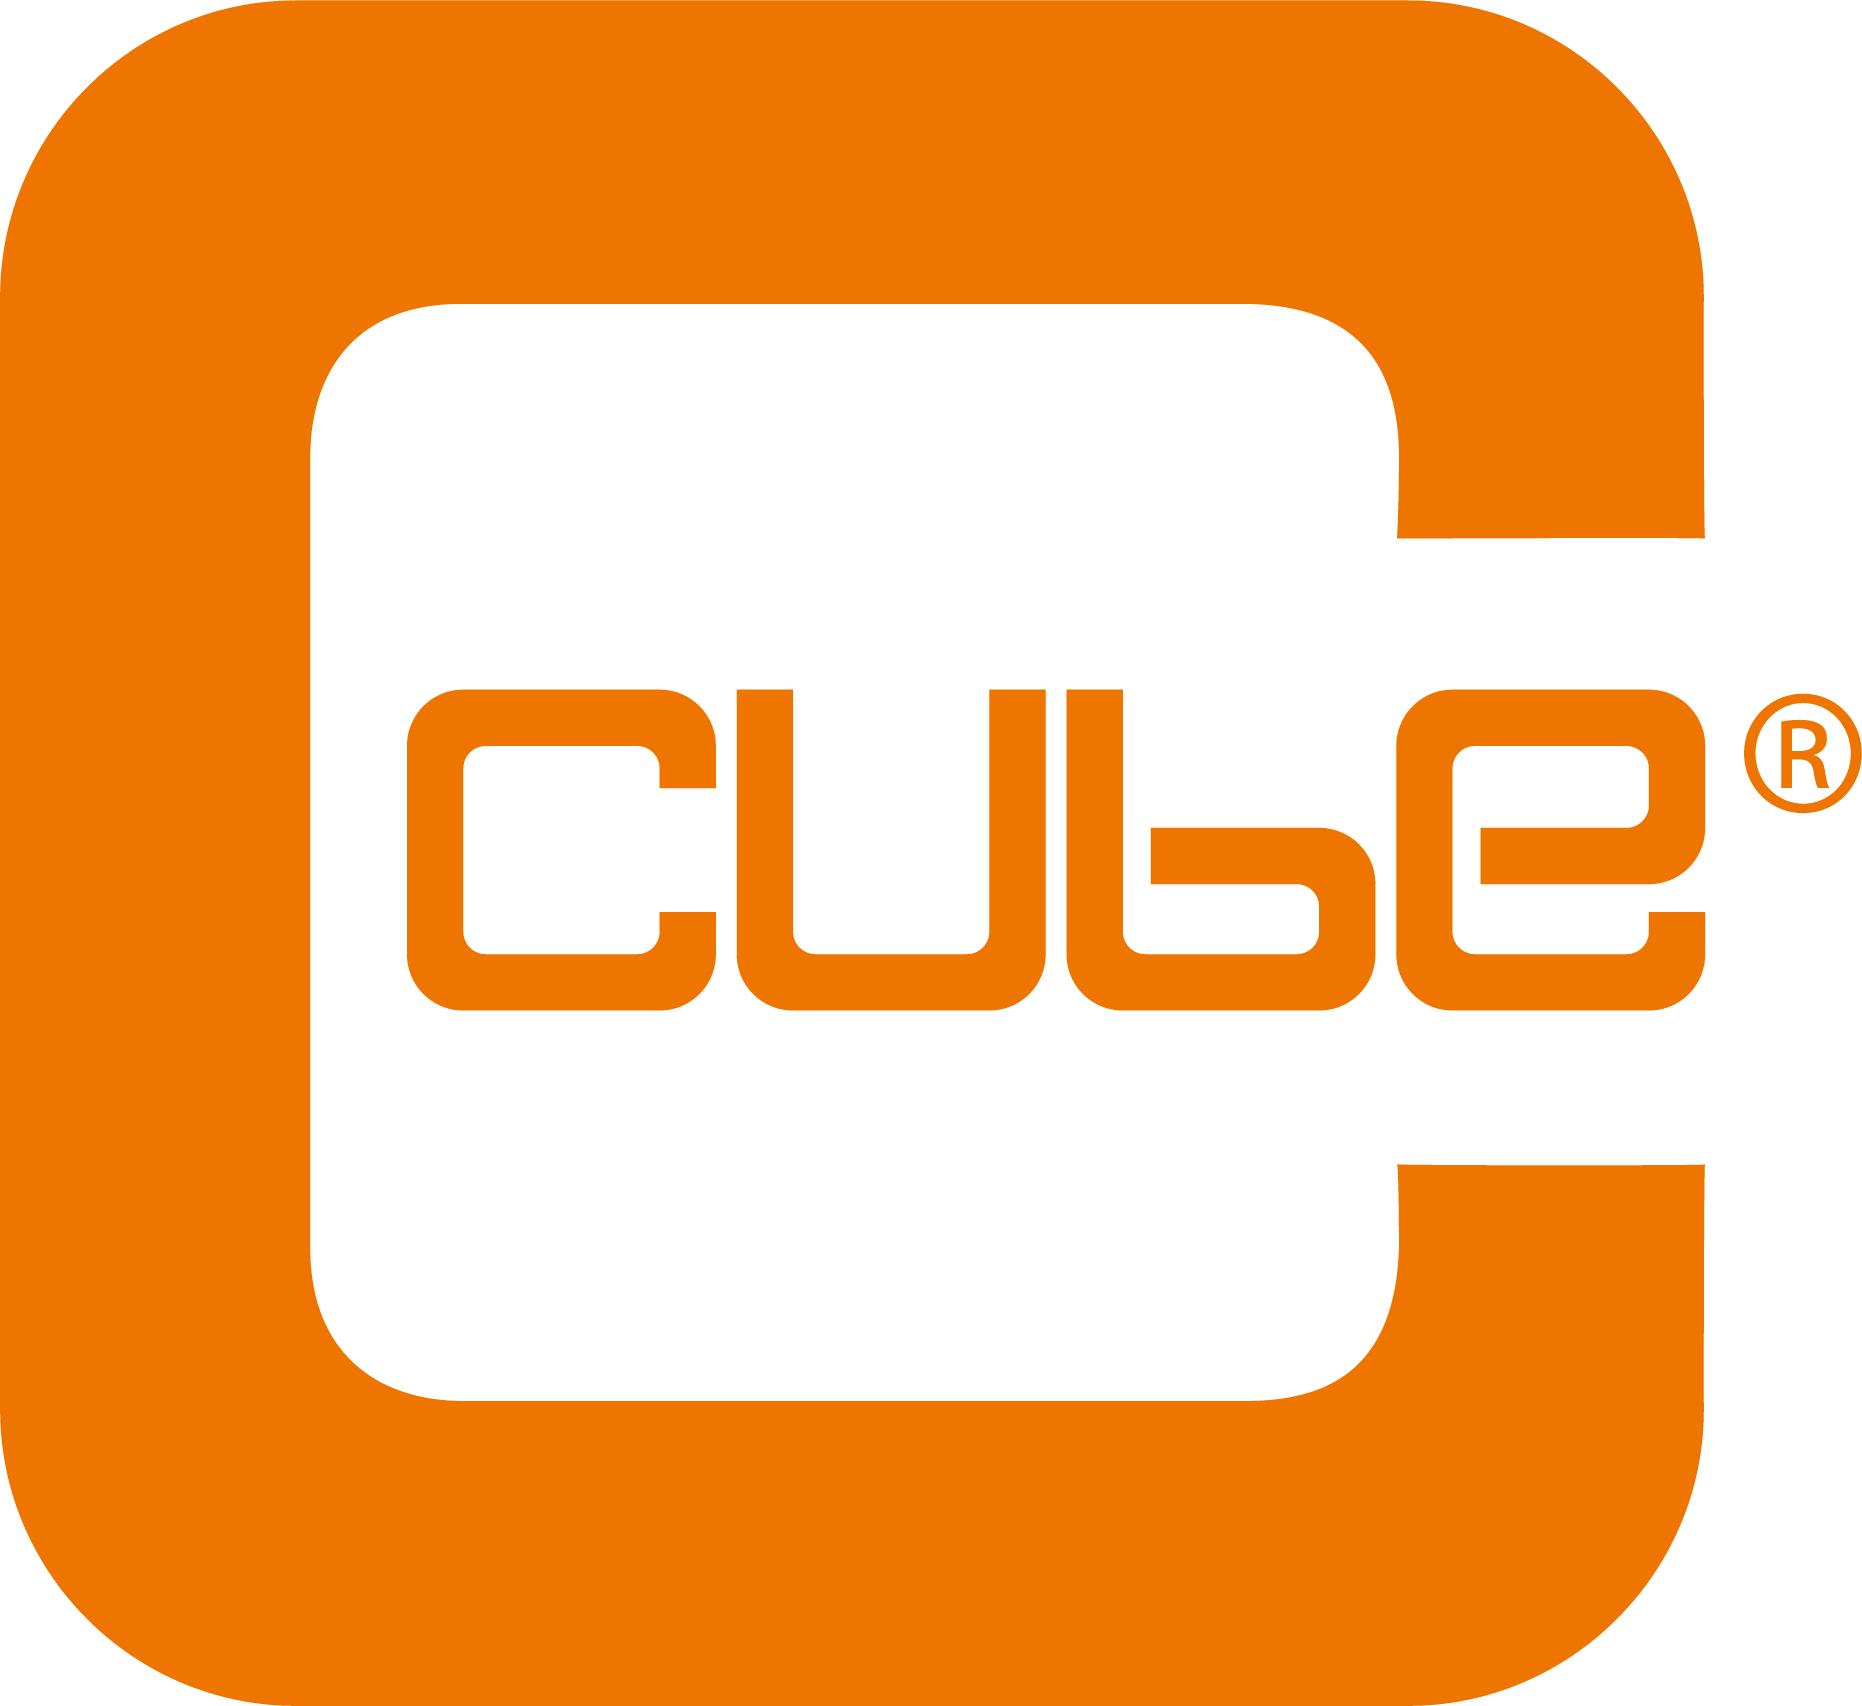 Cubelog ohne url pos 1C transparent 1